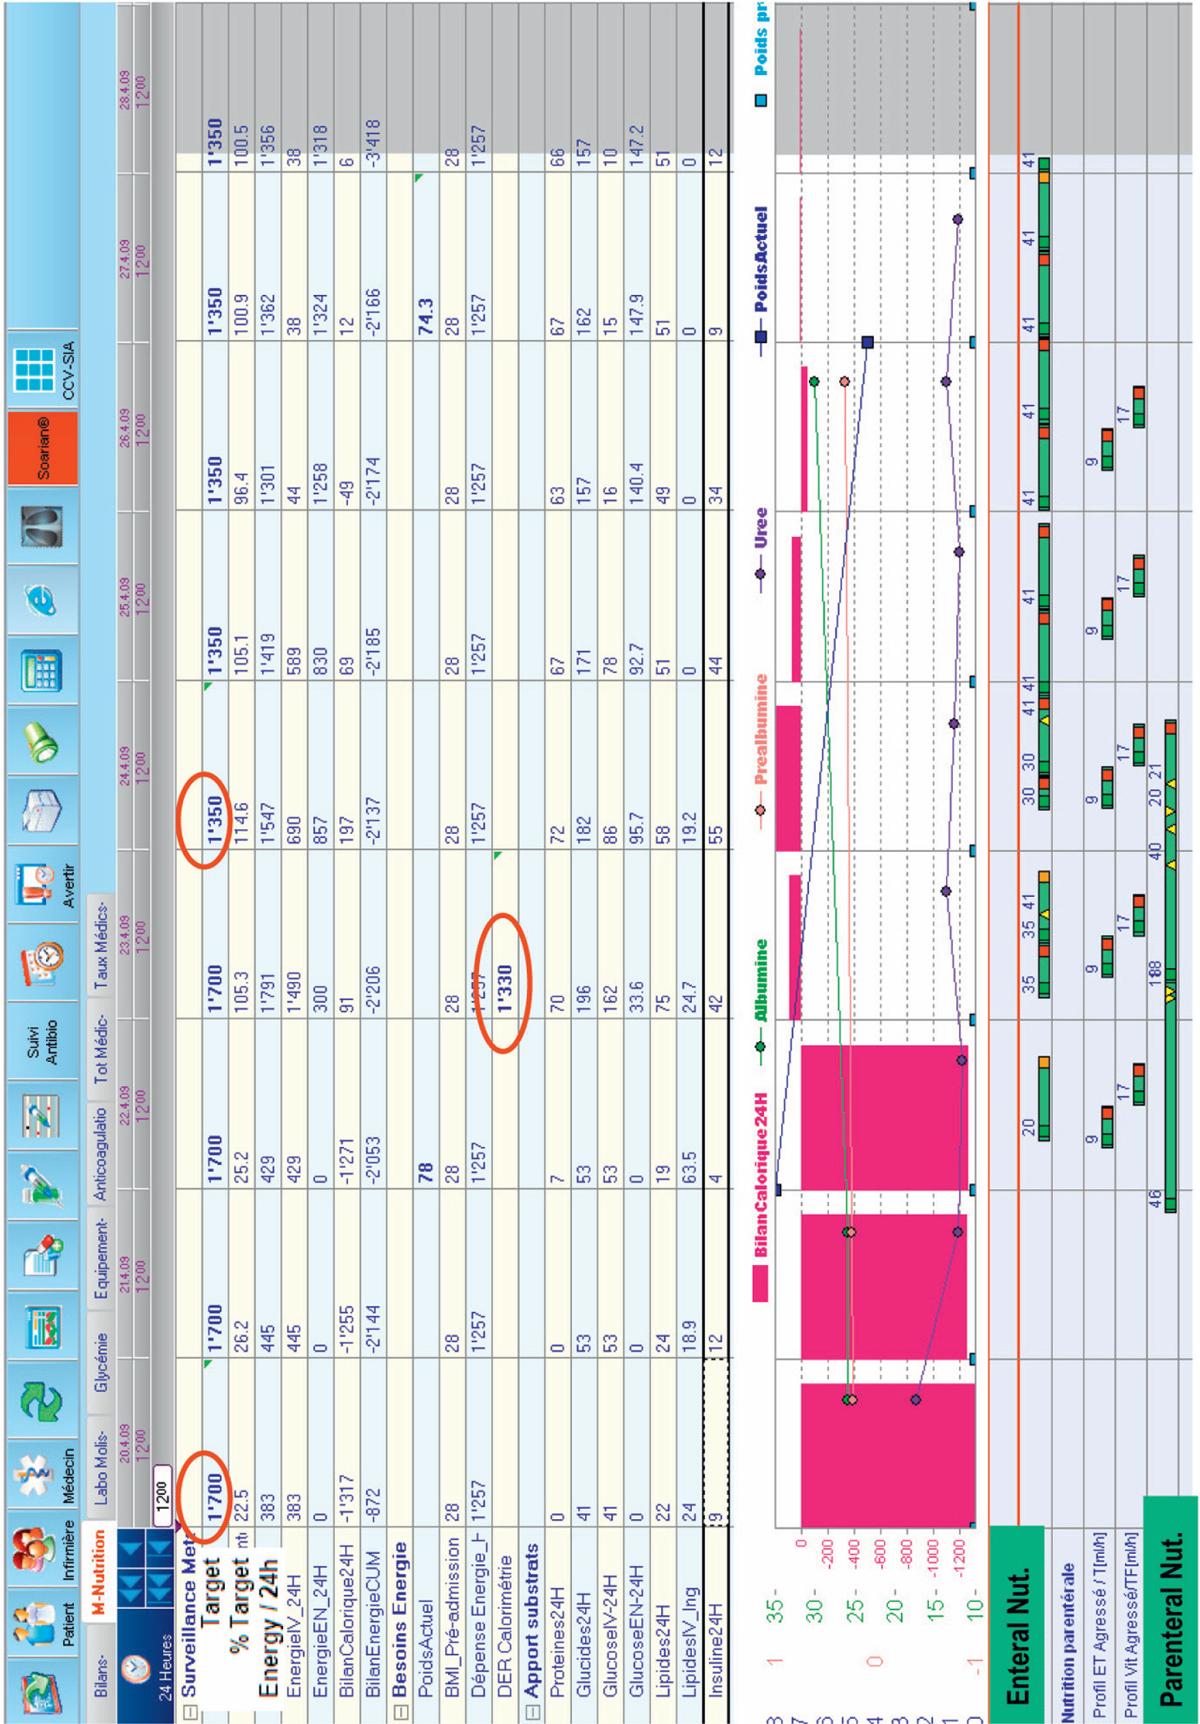 https://static-content.springer.com/image/art%3A10.1186%2Fcc11229/MediaObjects/13054_2012_Article_314_Fig2_HTML.jpg